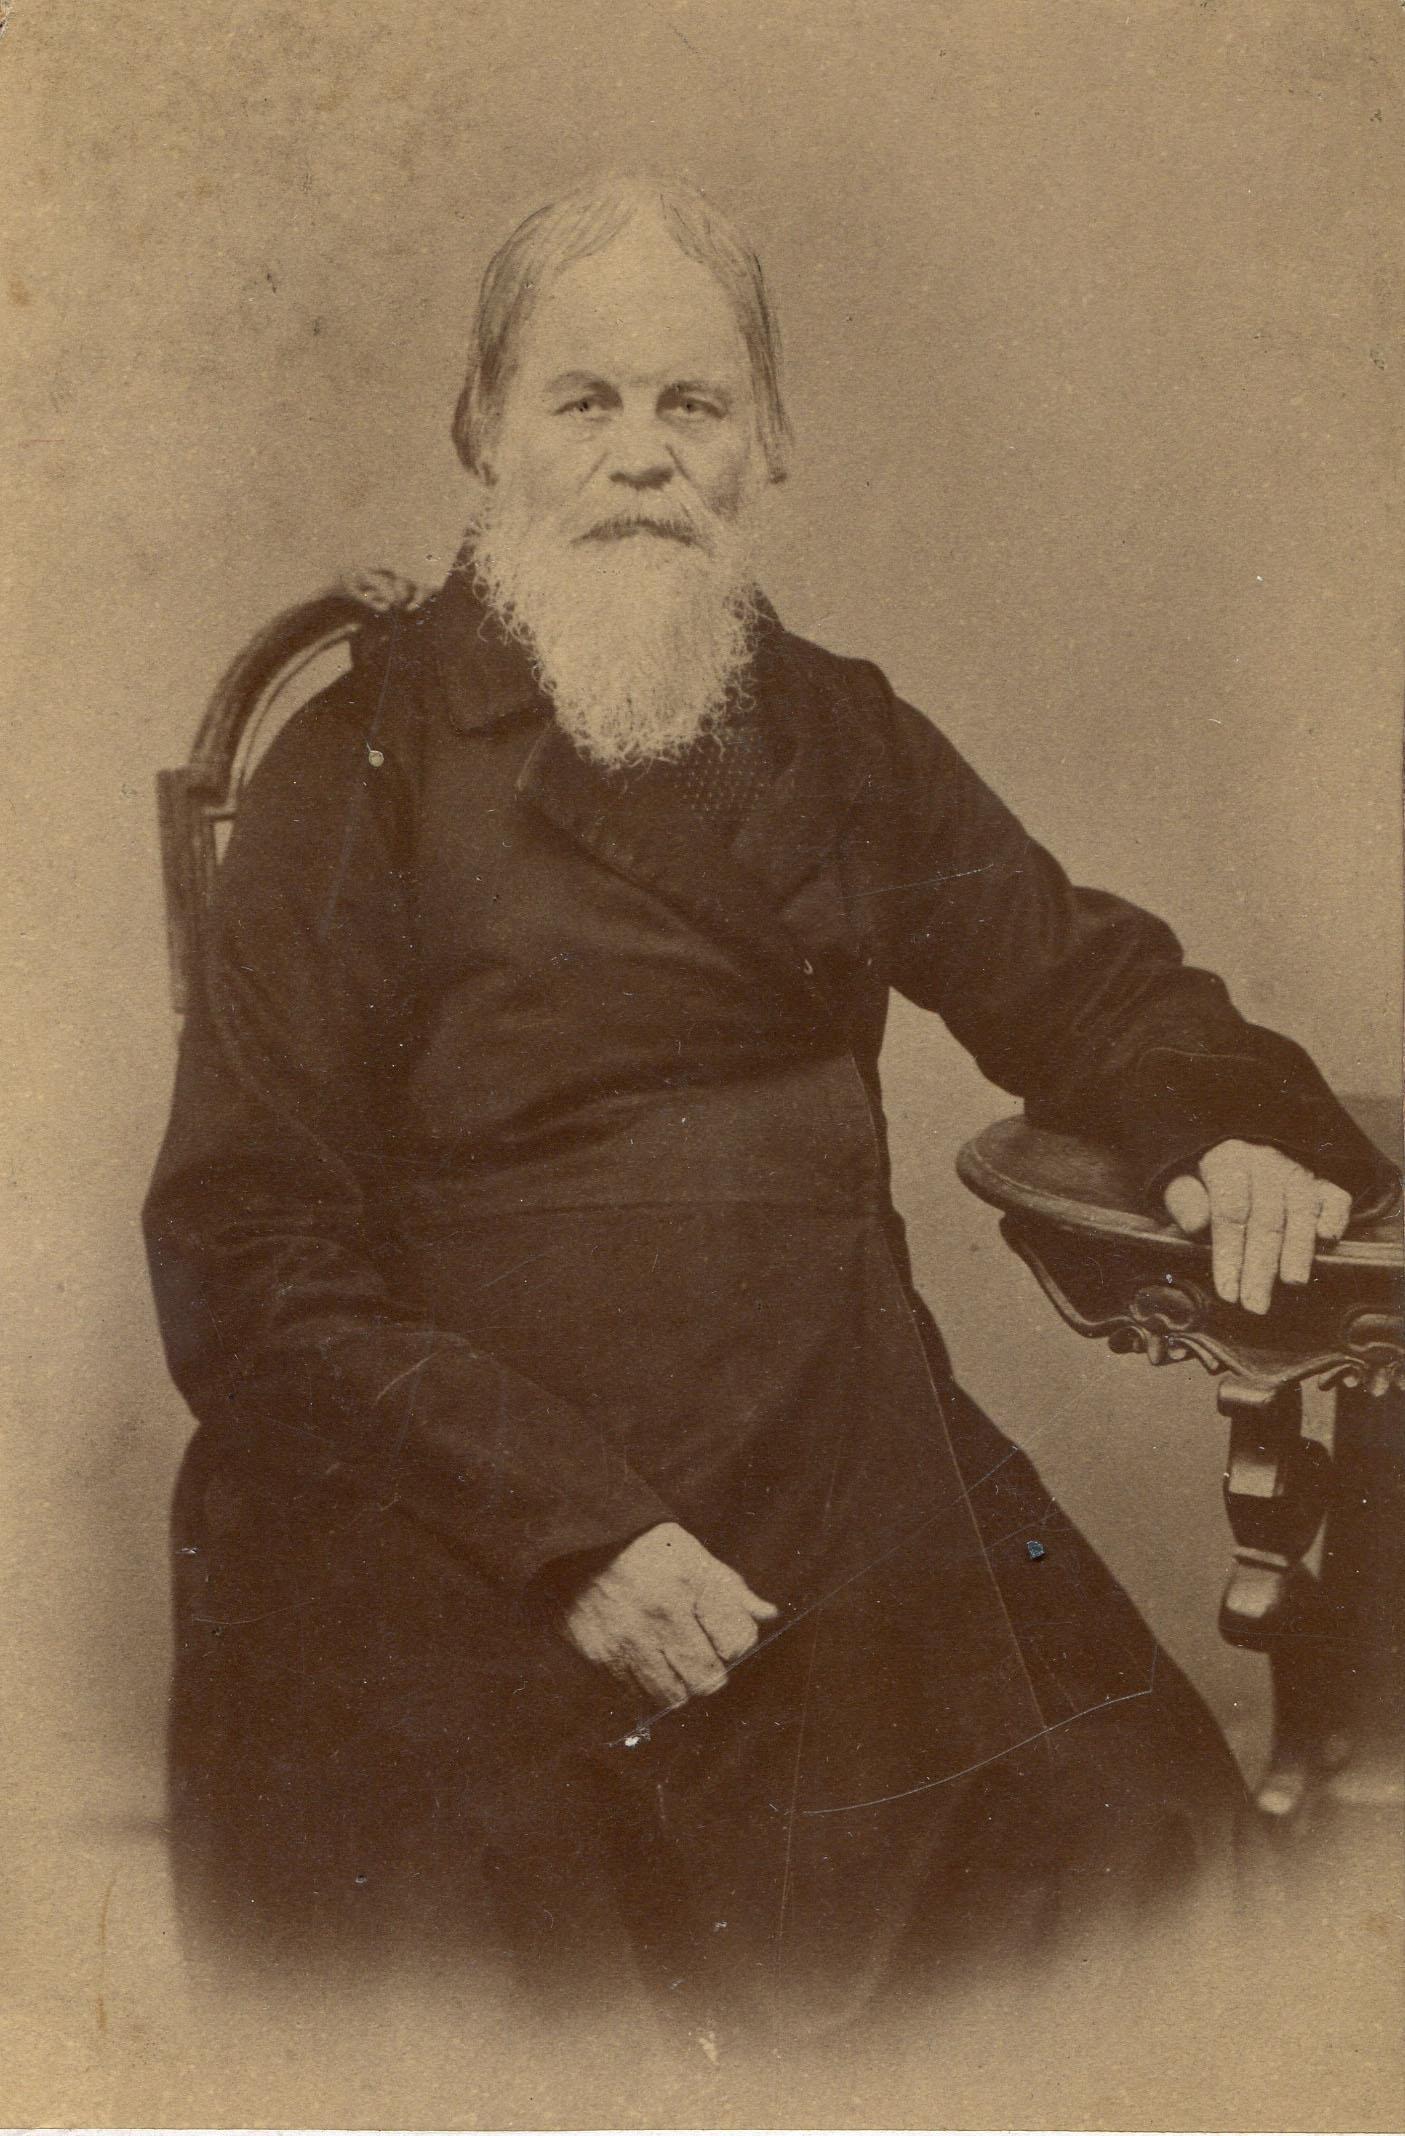 Портрет купца Петра Ивановича Мяздрикова (был городским головой Мурома в 1854-1857 гг.)  1890-е